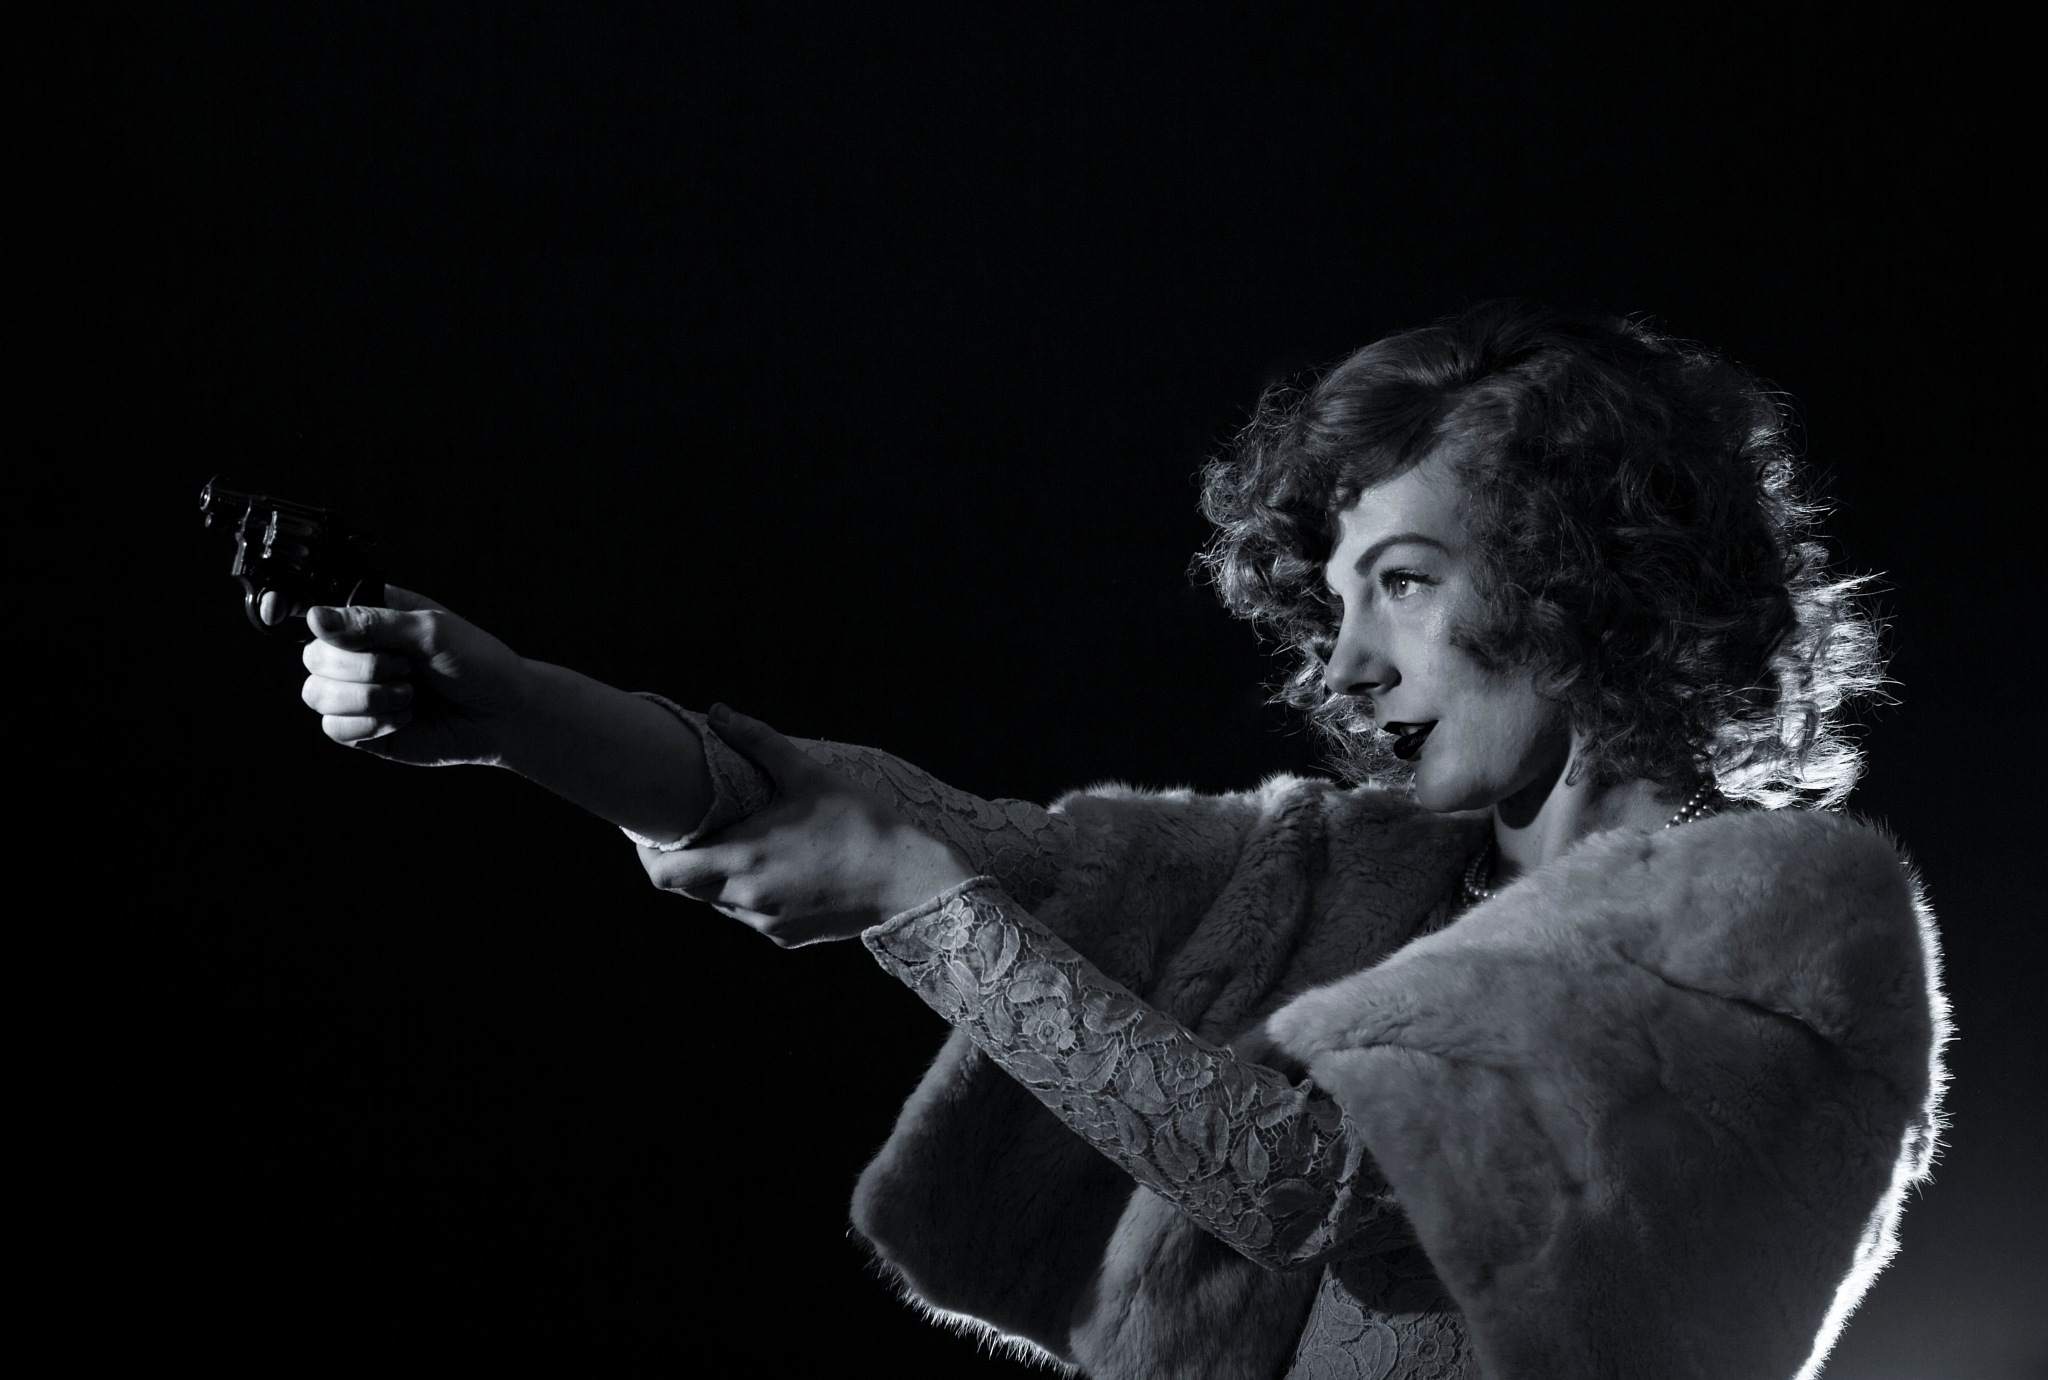 Film Noir by Annabel Homewood